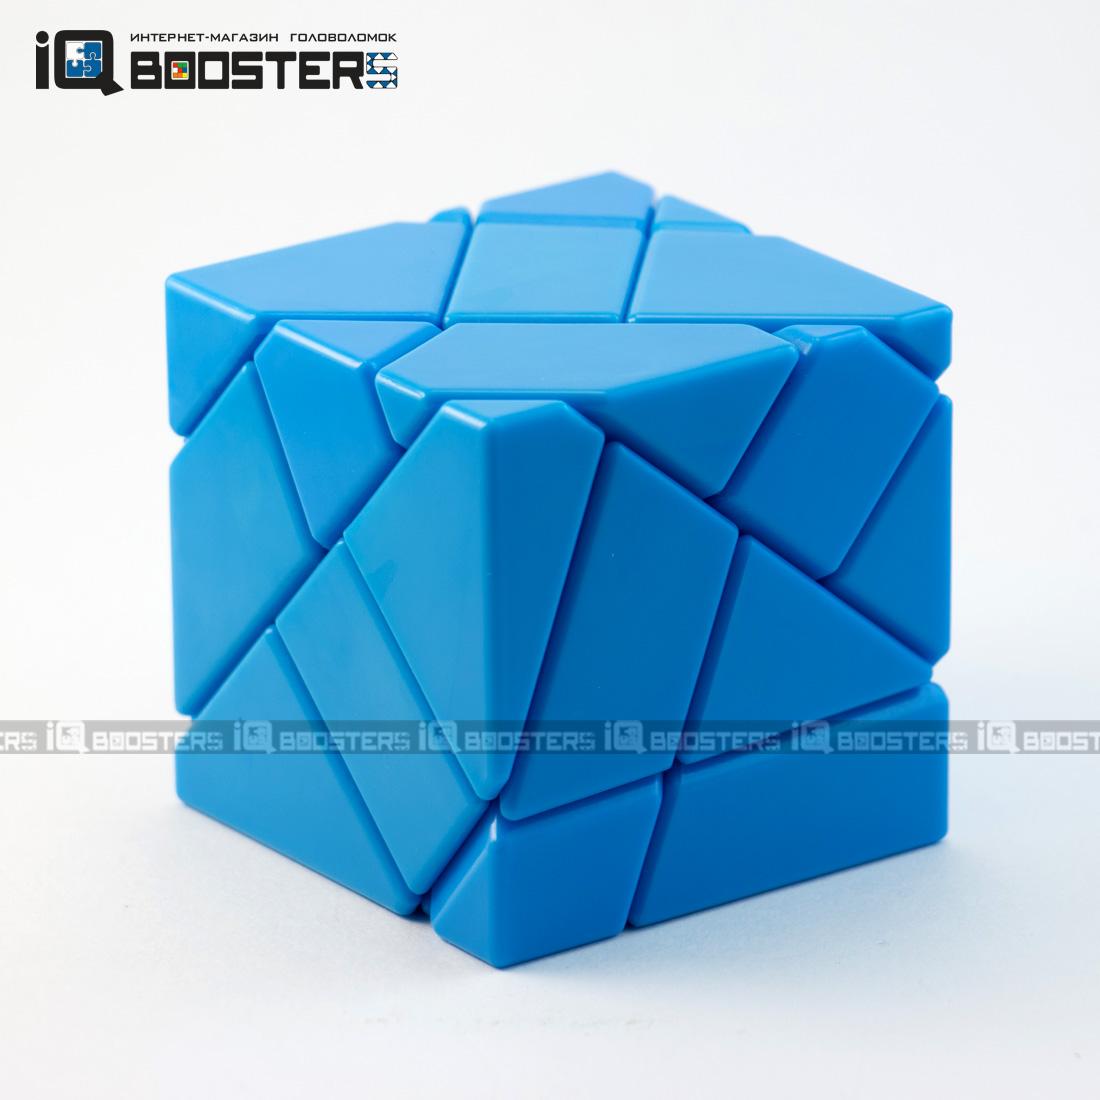 ninja_ghost_cube_8bl